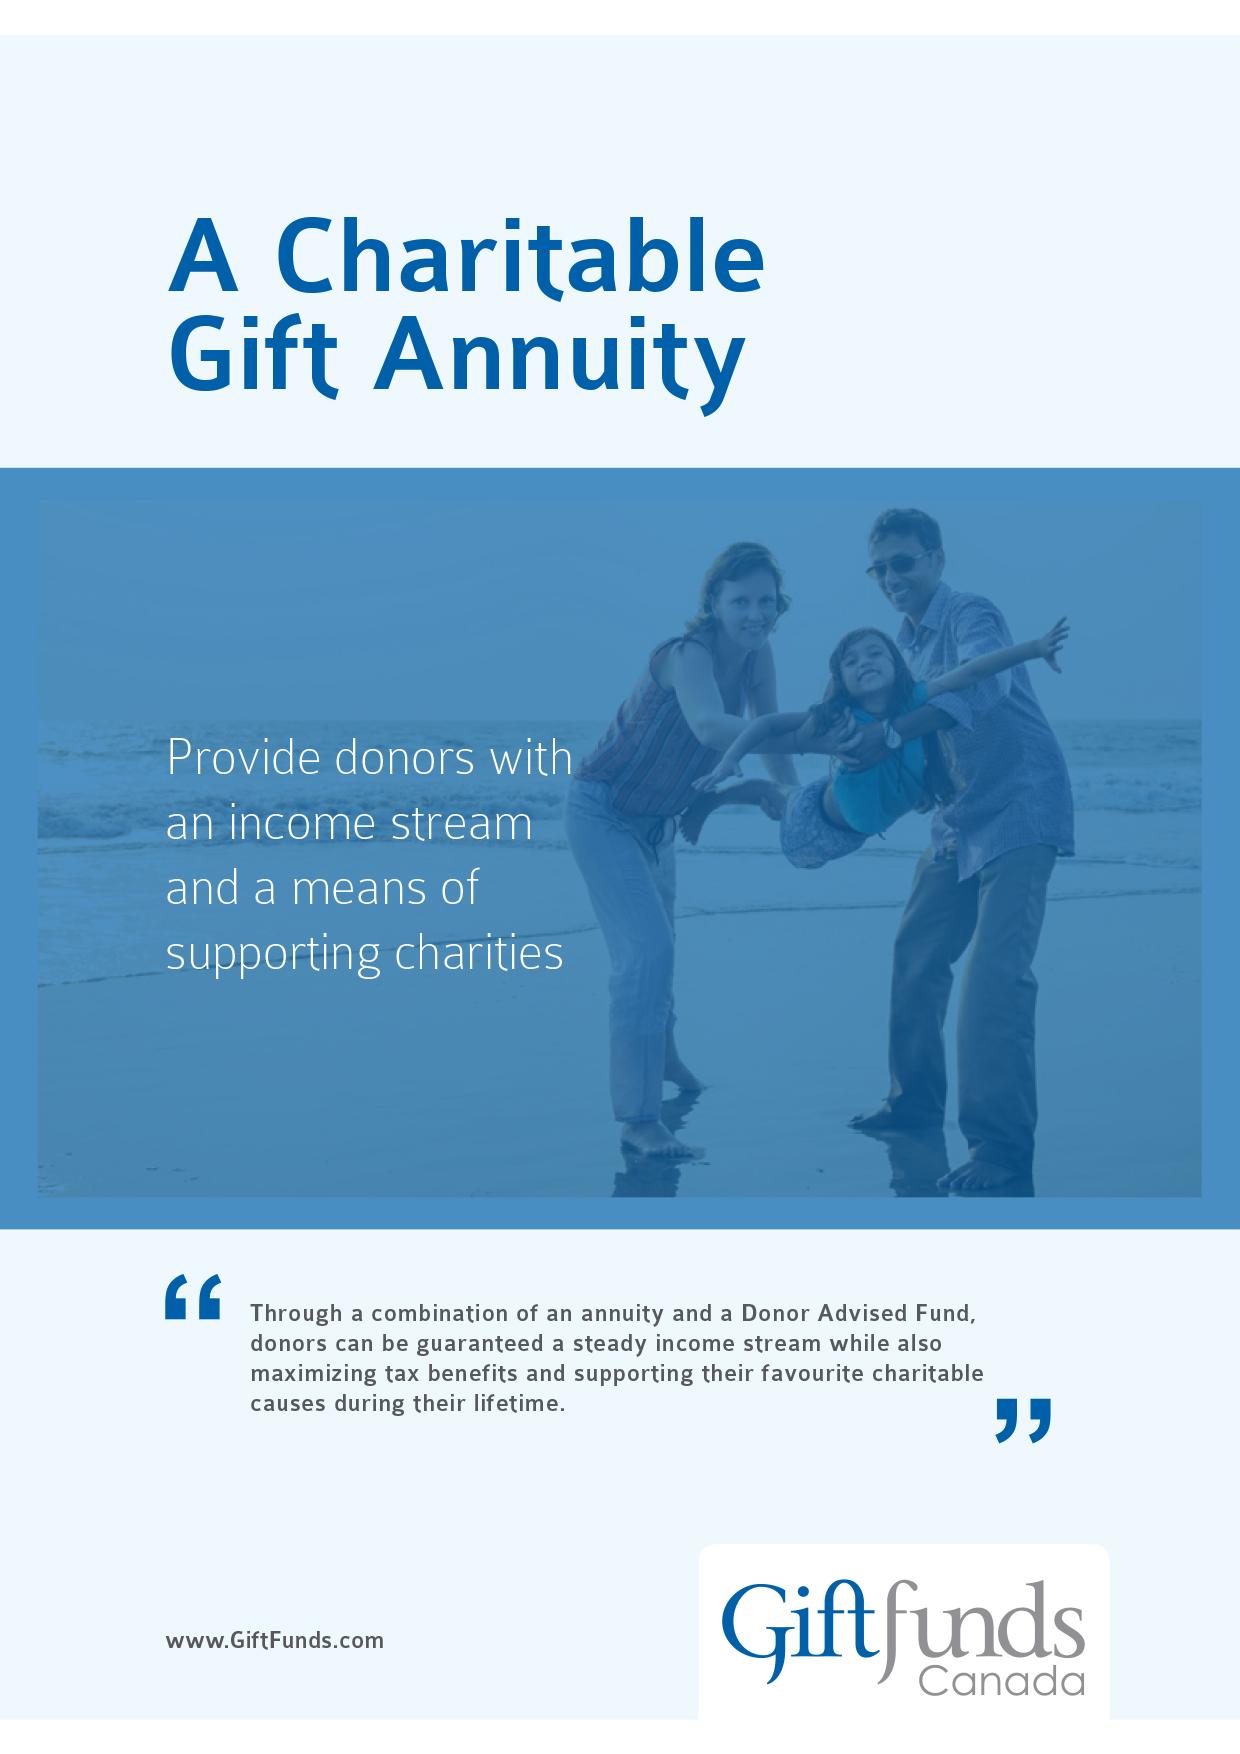 Charitible_Gift_Annuity.jpg